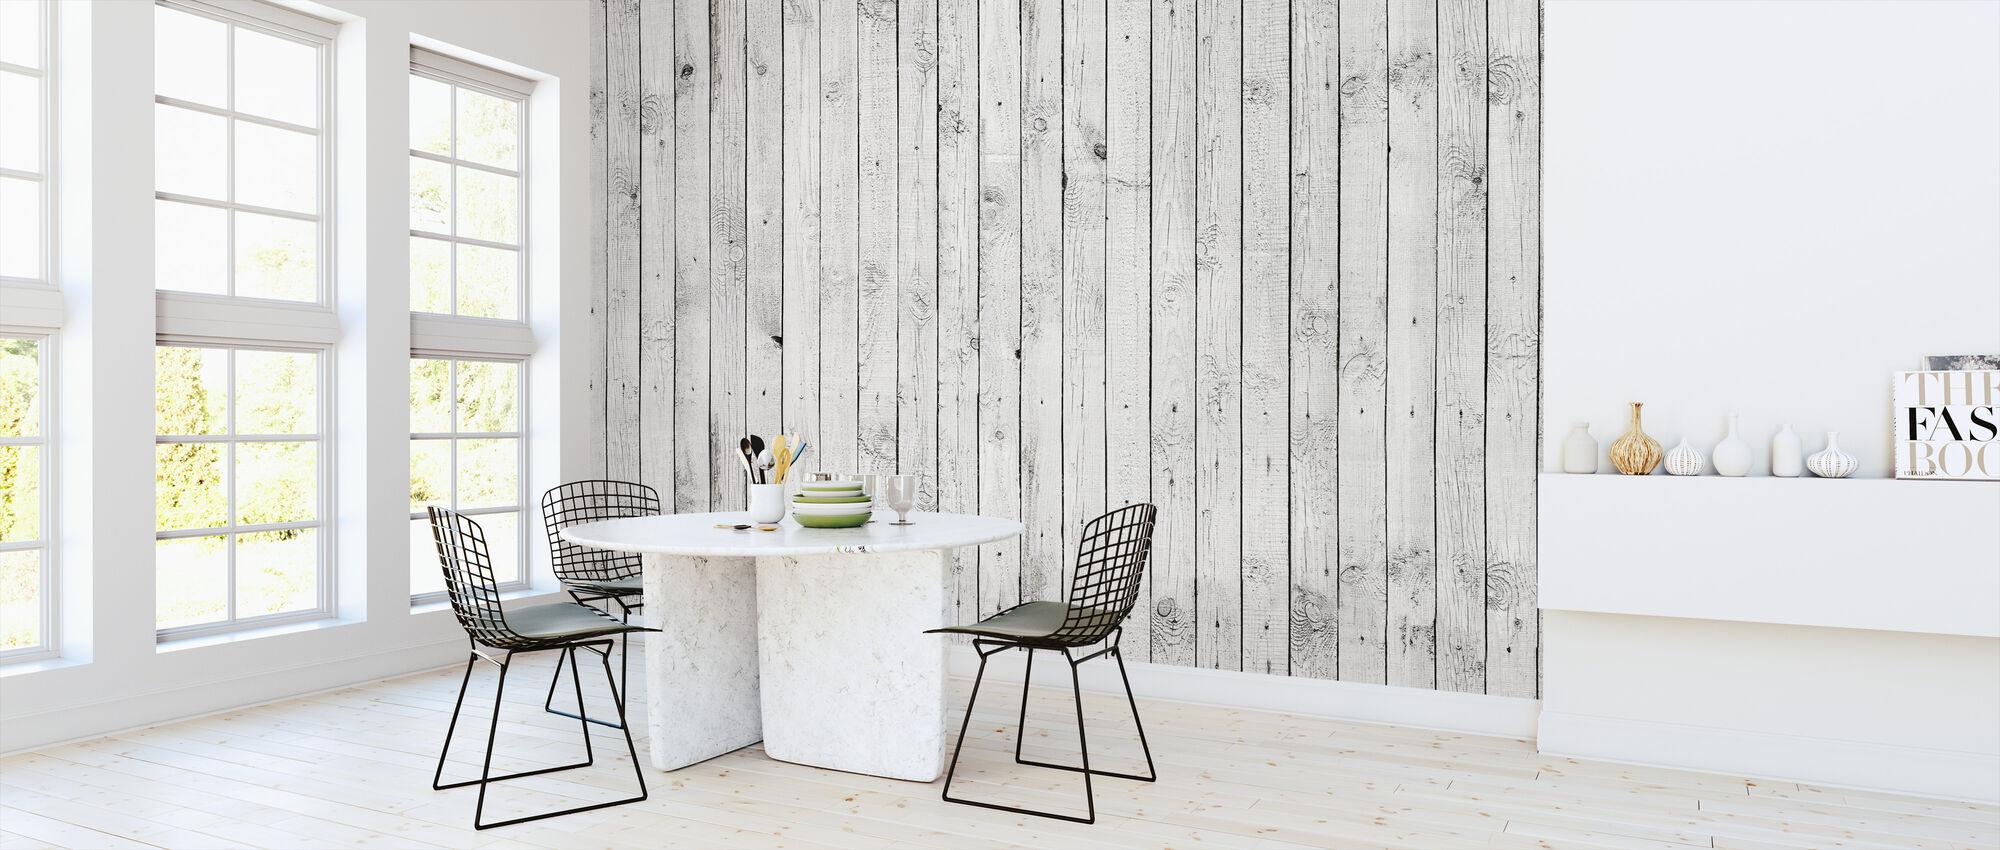 Vitt målat trä - Tapet - Kök